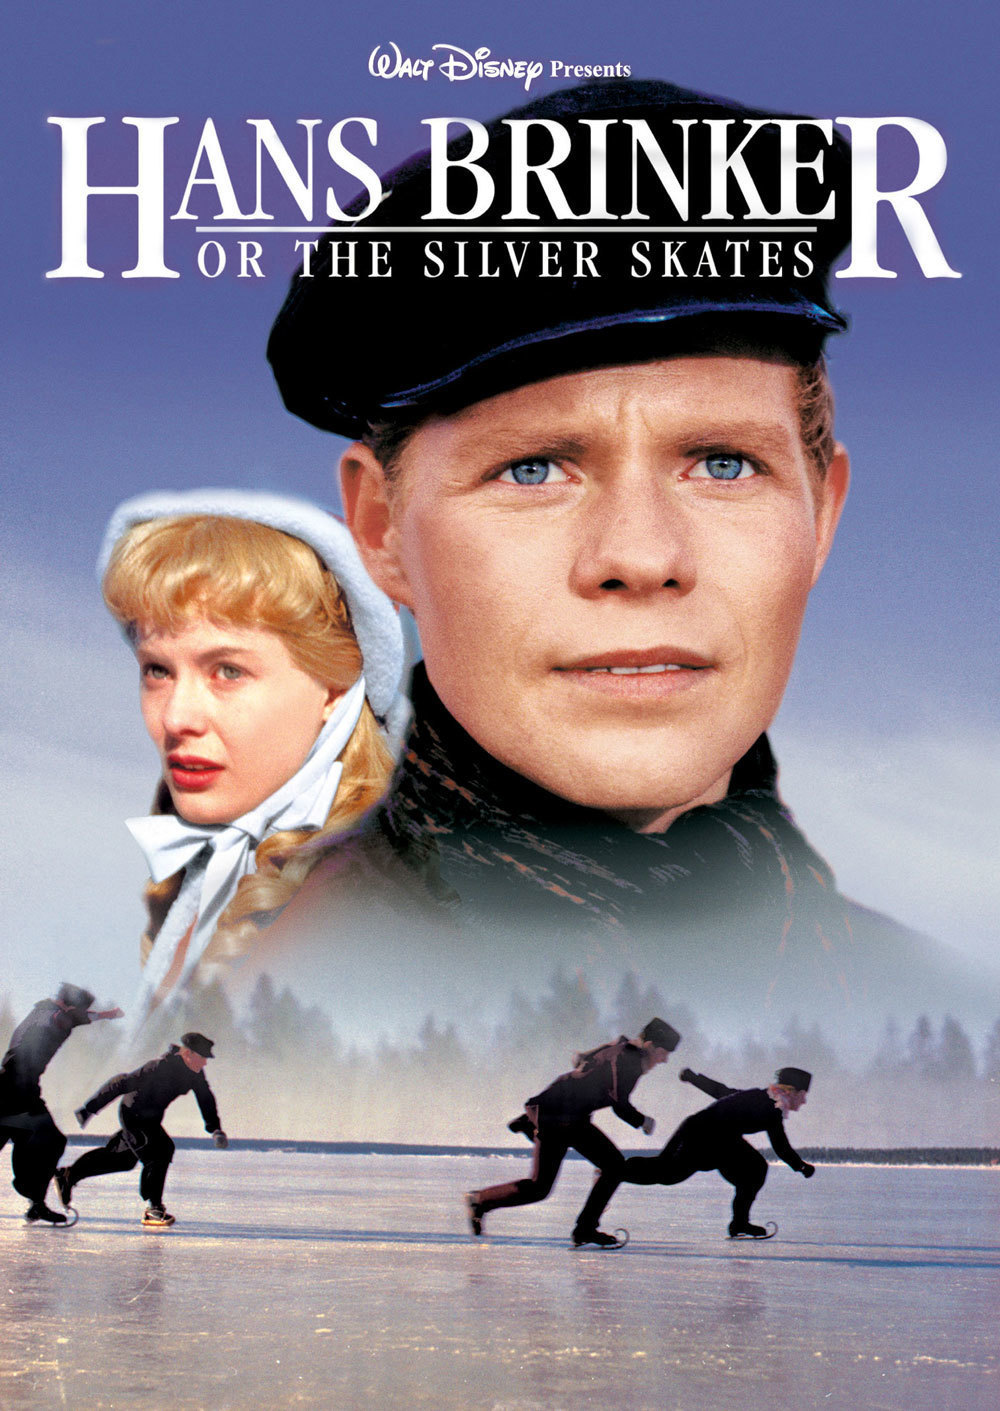 Hans Brinker o los patines de plata